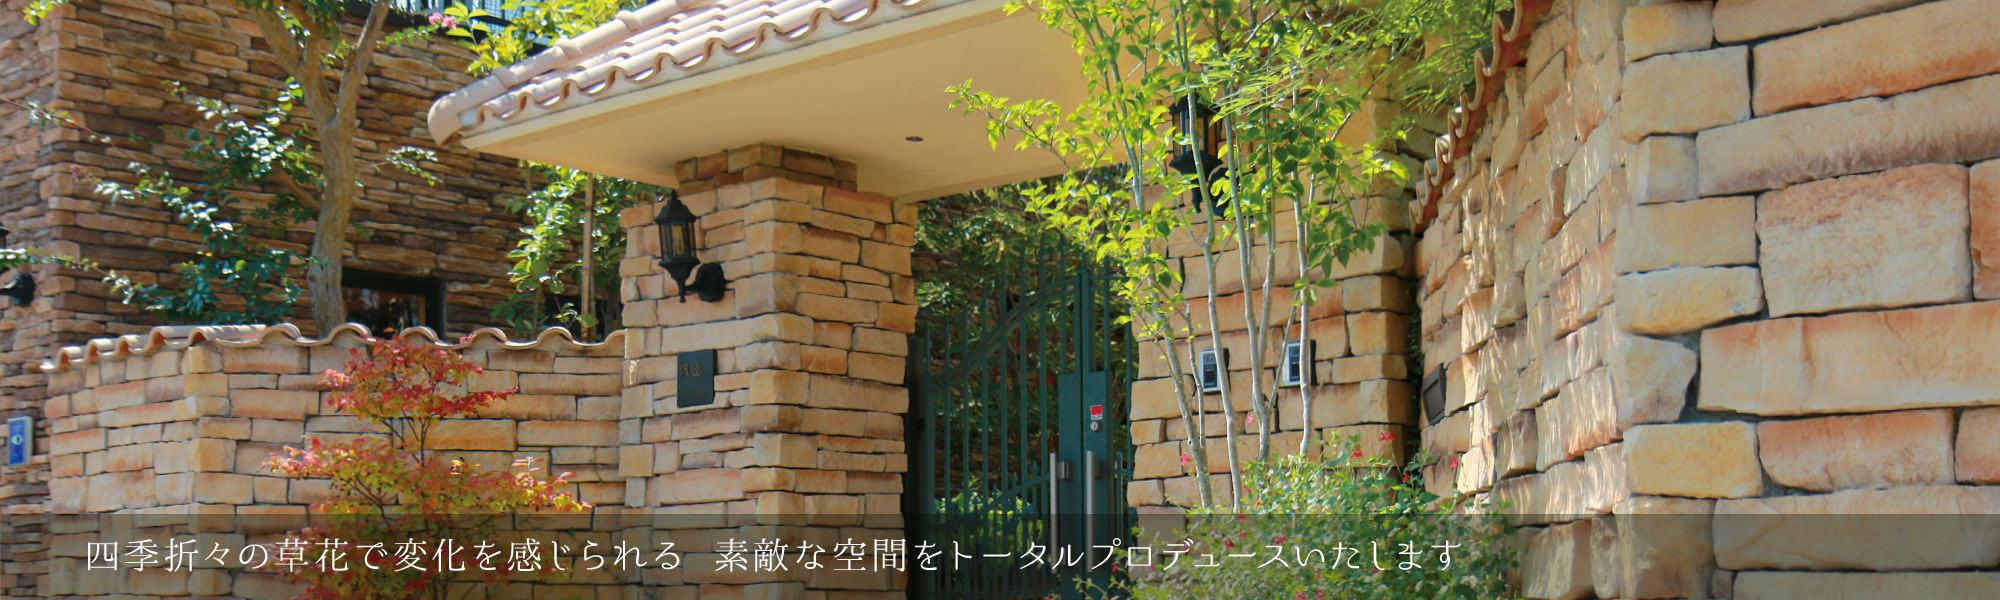 <a href='http://yakigaya-zouen.com/archives/674'></a>